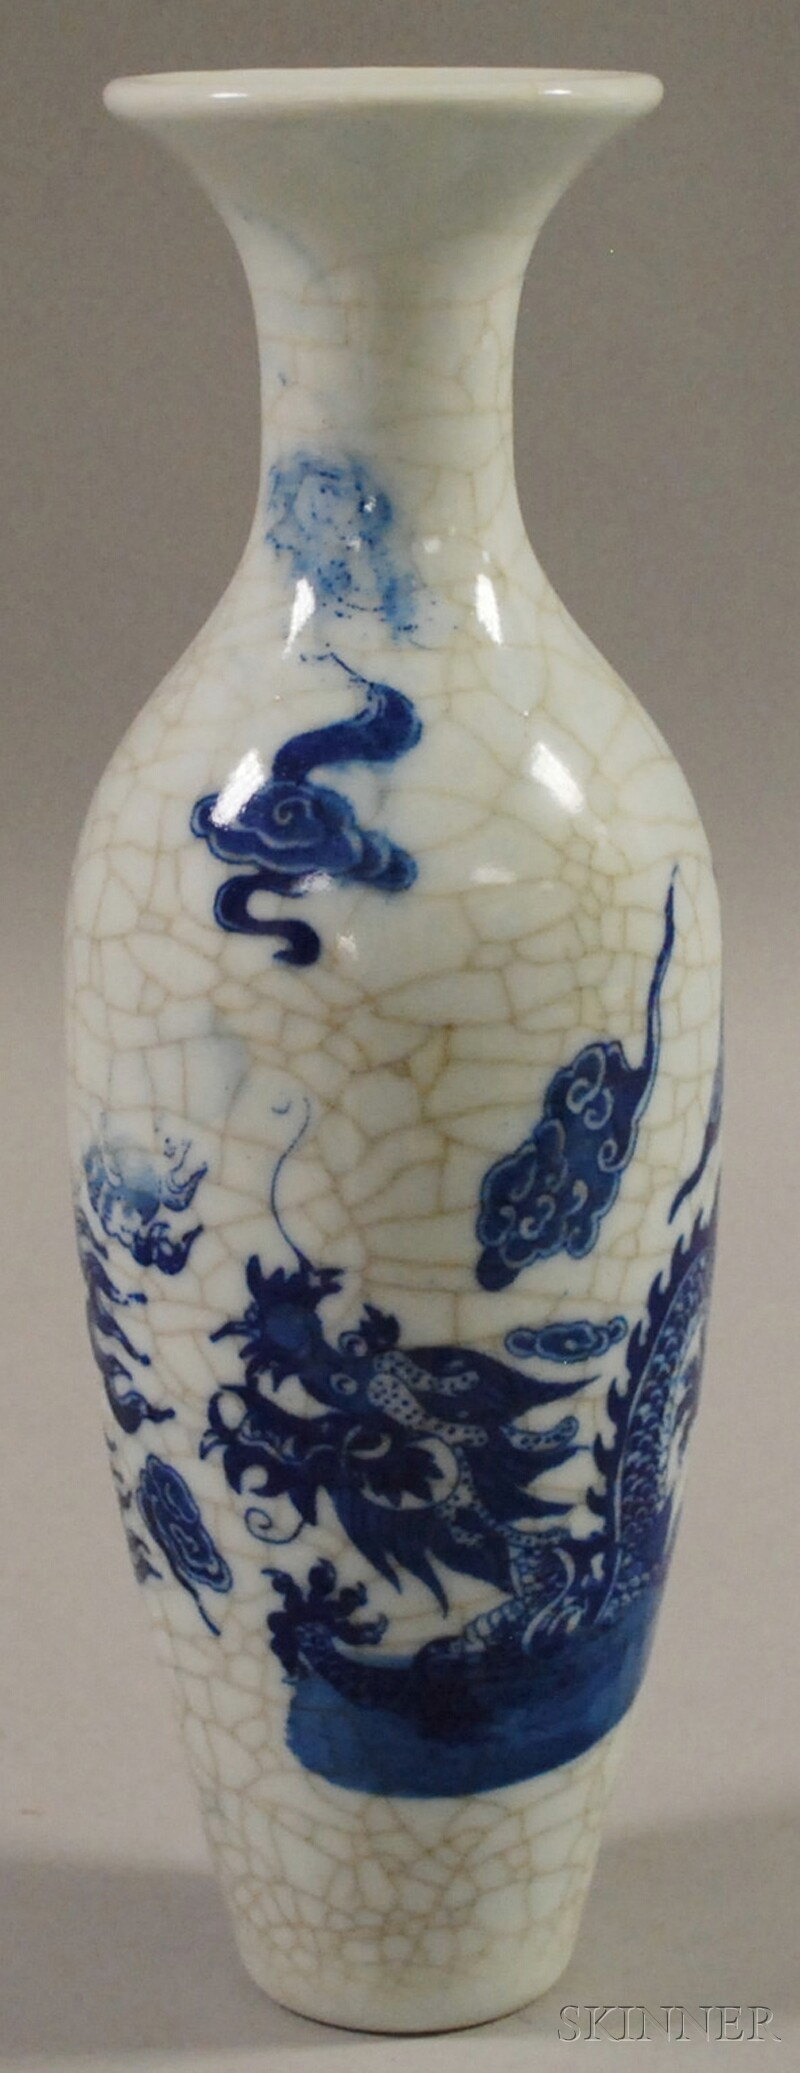 Asian Blue and White Crackle Glazed Ceramic Vase